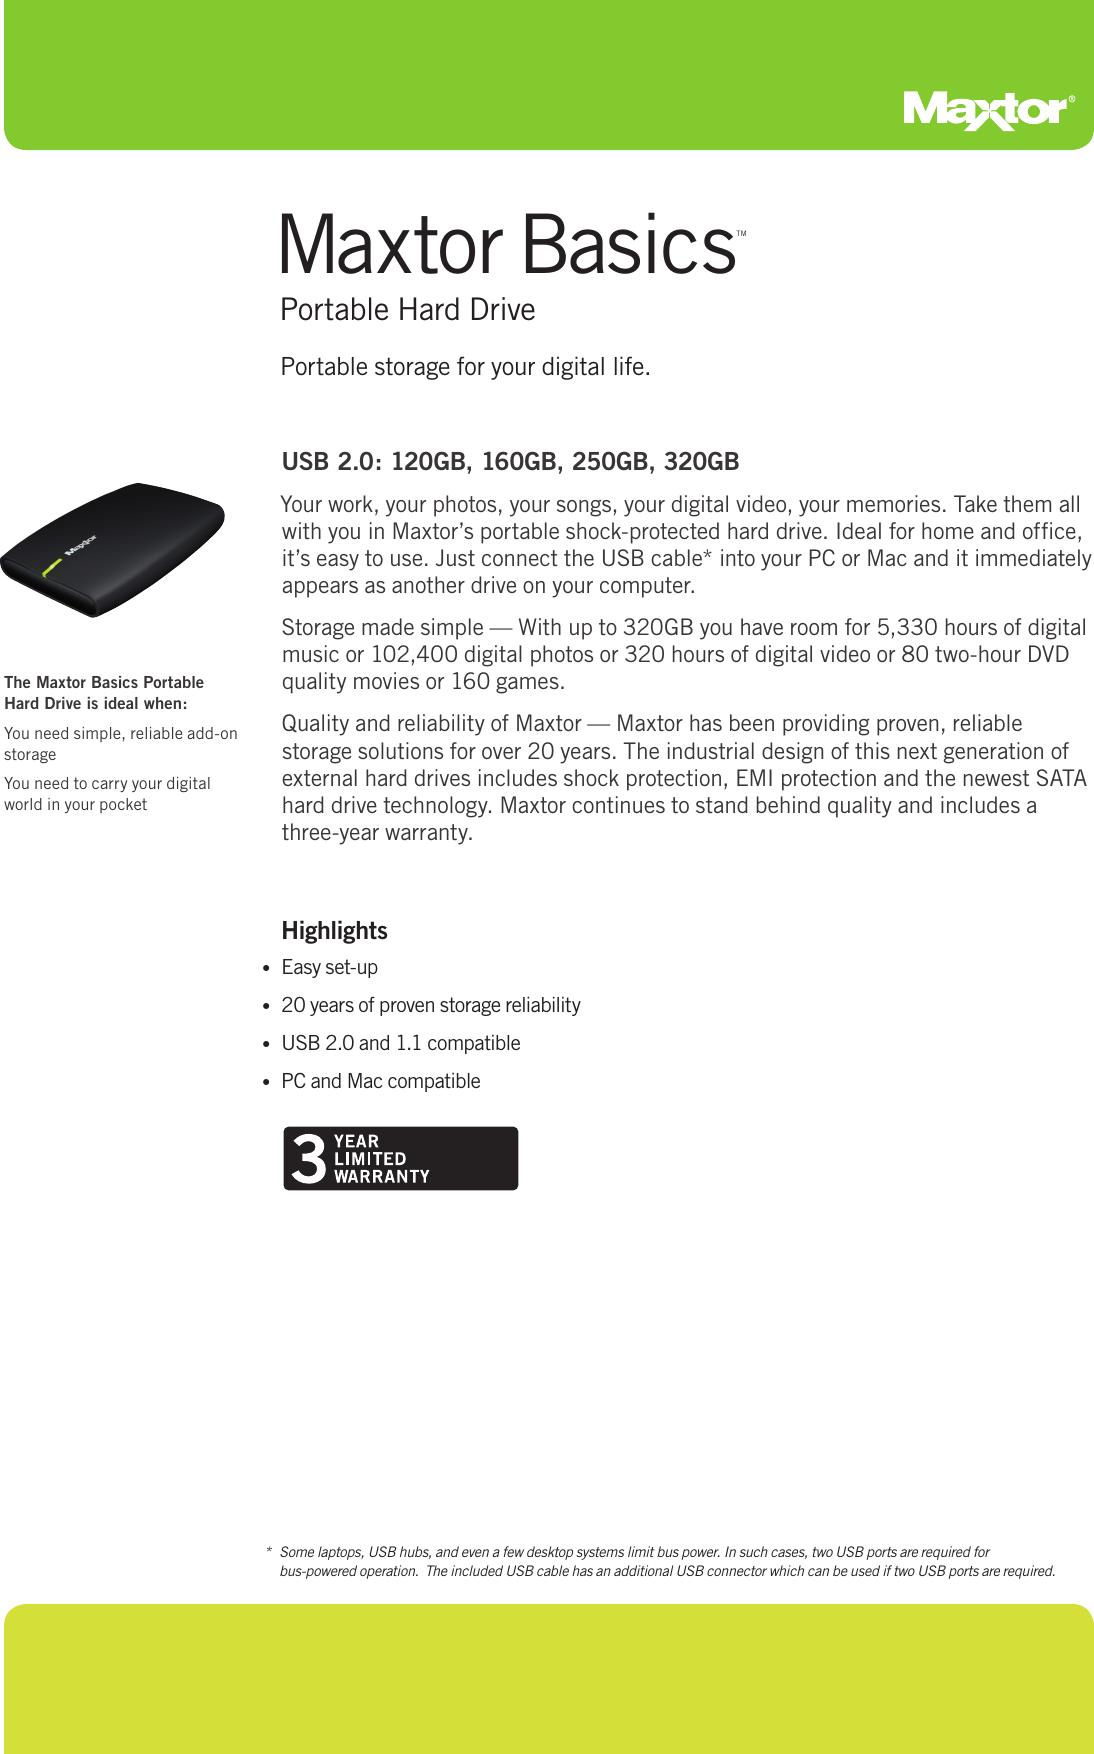 MAXTOR BASICS PORTABLE USB DEVICE DRIVER FOR WINDOWS 10